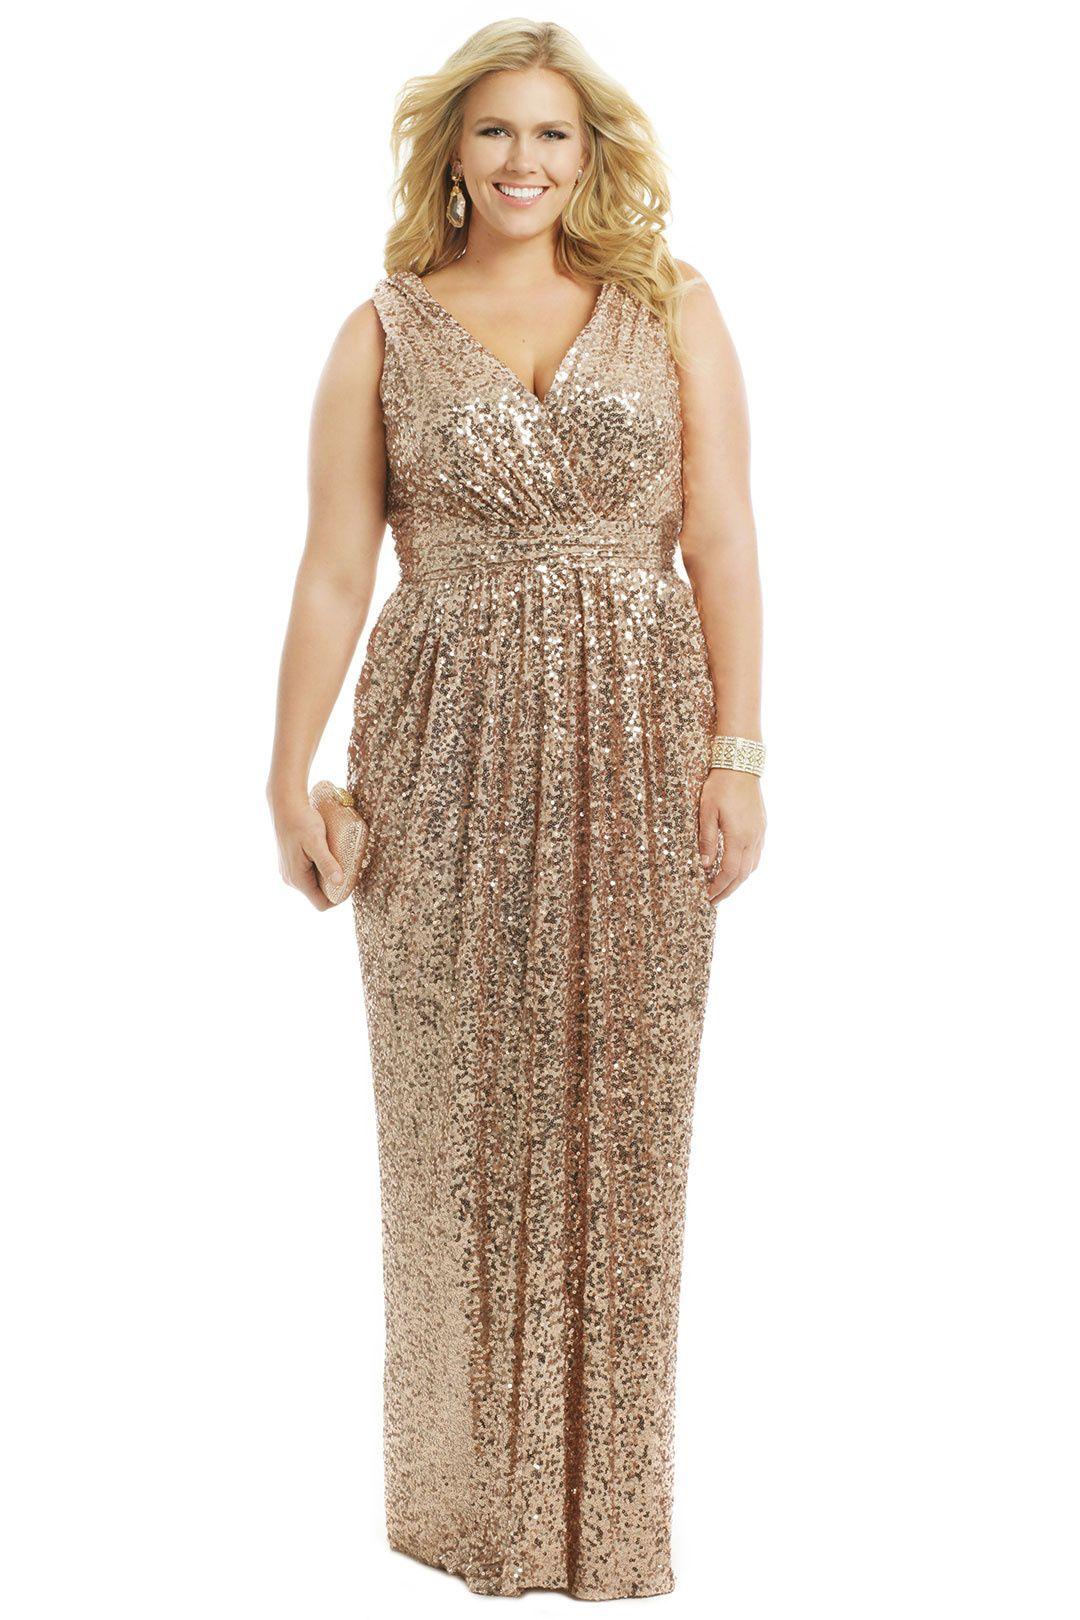 Sequined Bridesmaid Dress | Wedding Ideas | Pinterest | Badgley ...